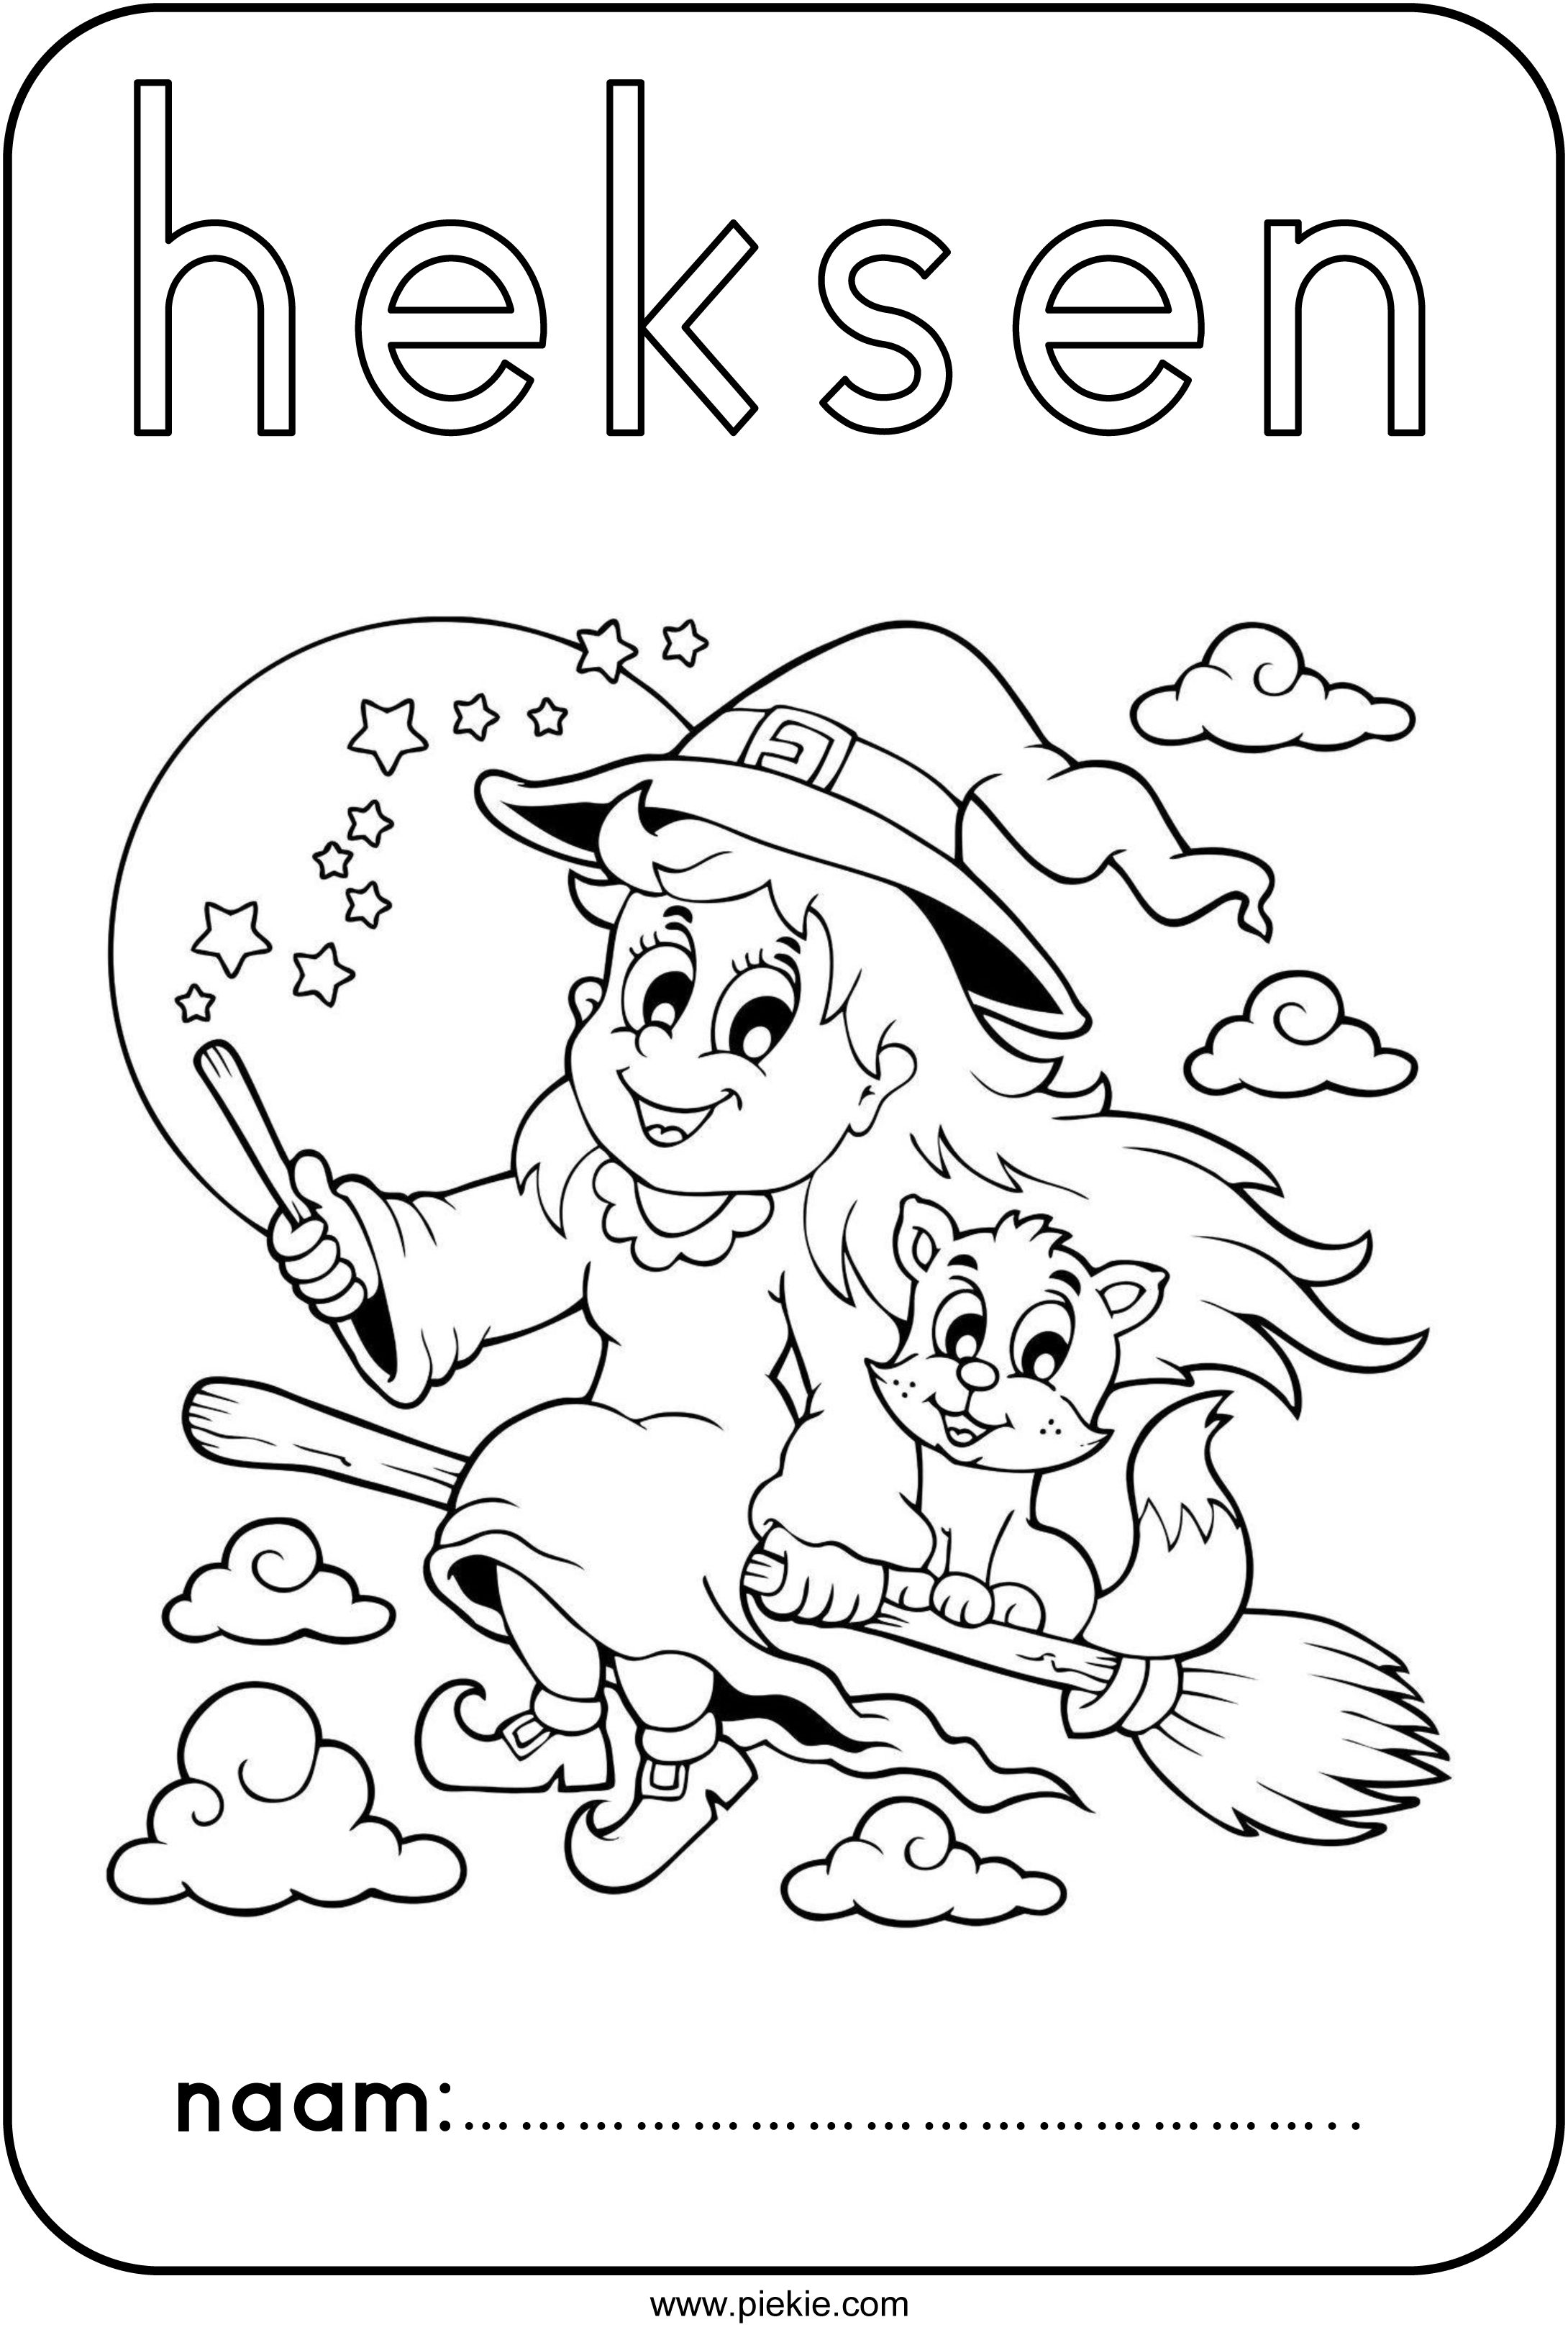 werkboekje heksen griezelig pompoenen